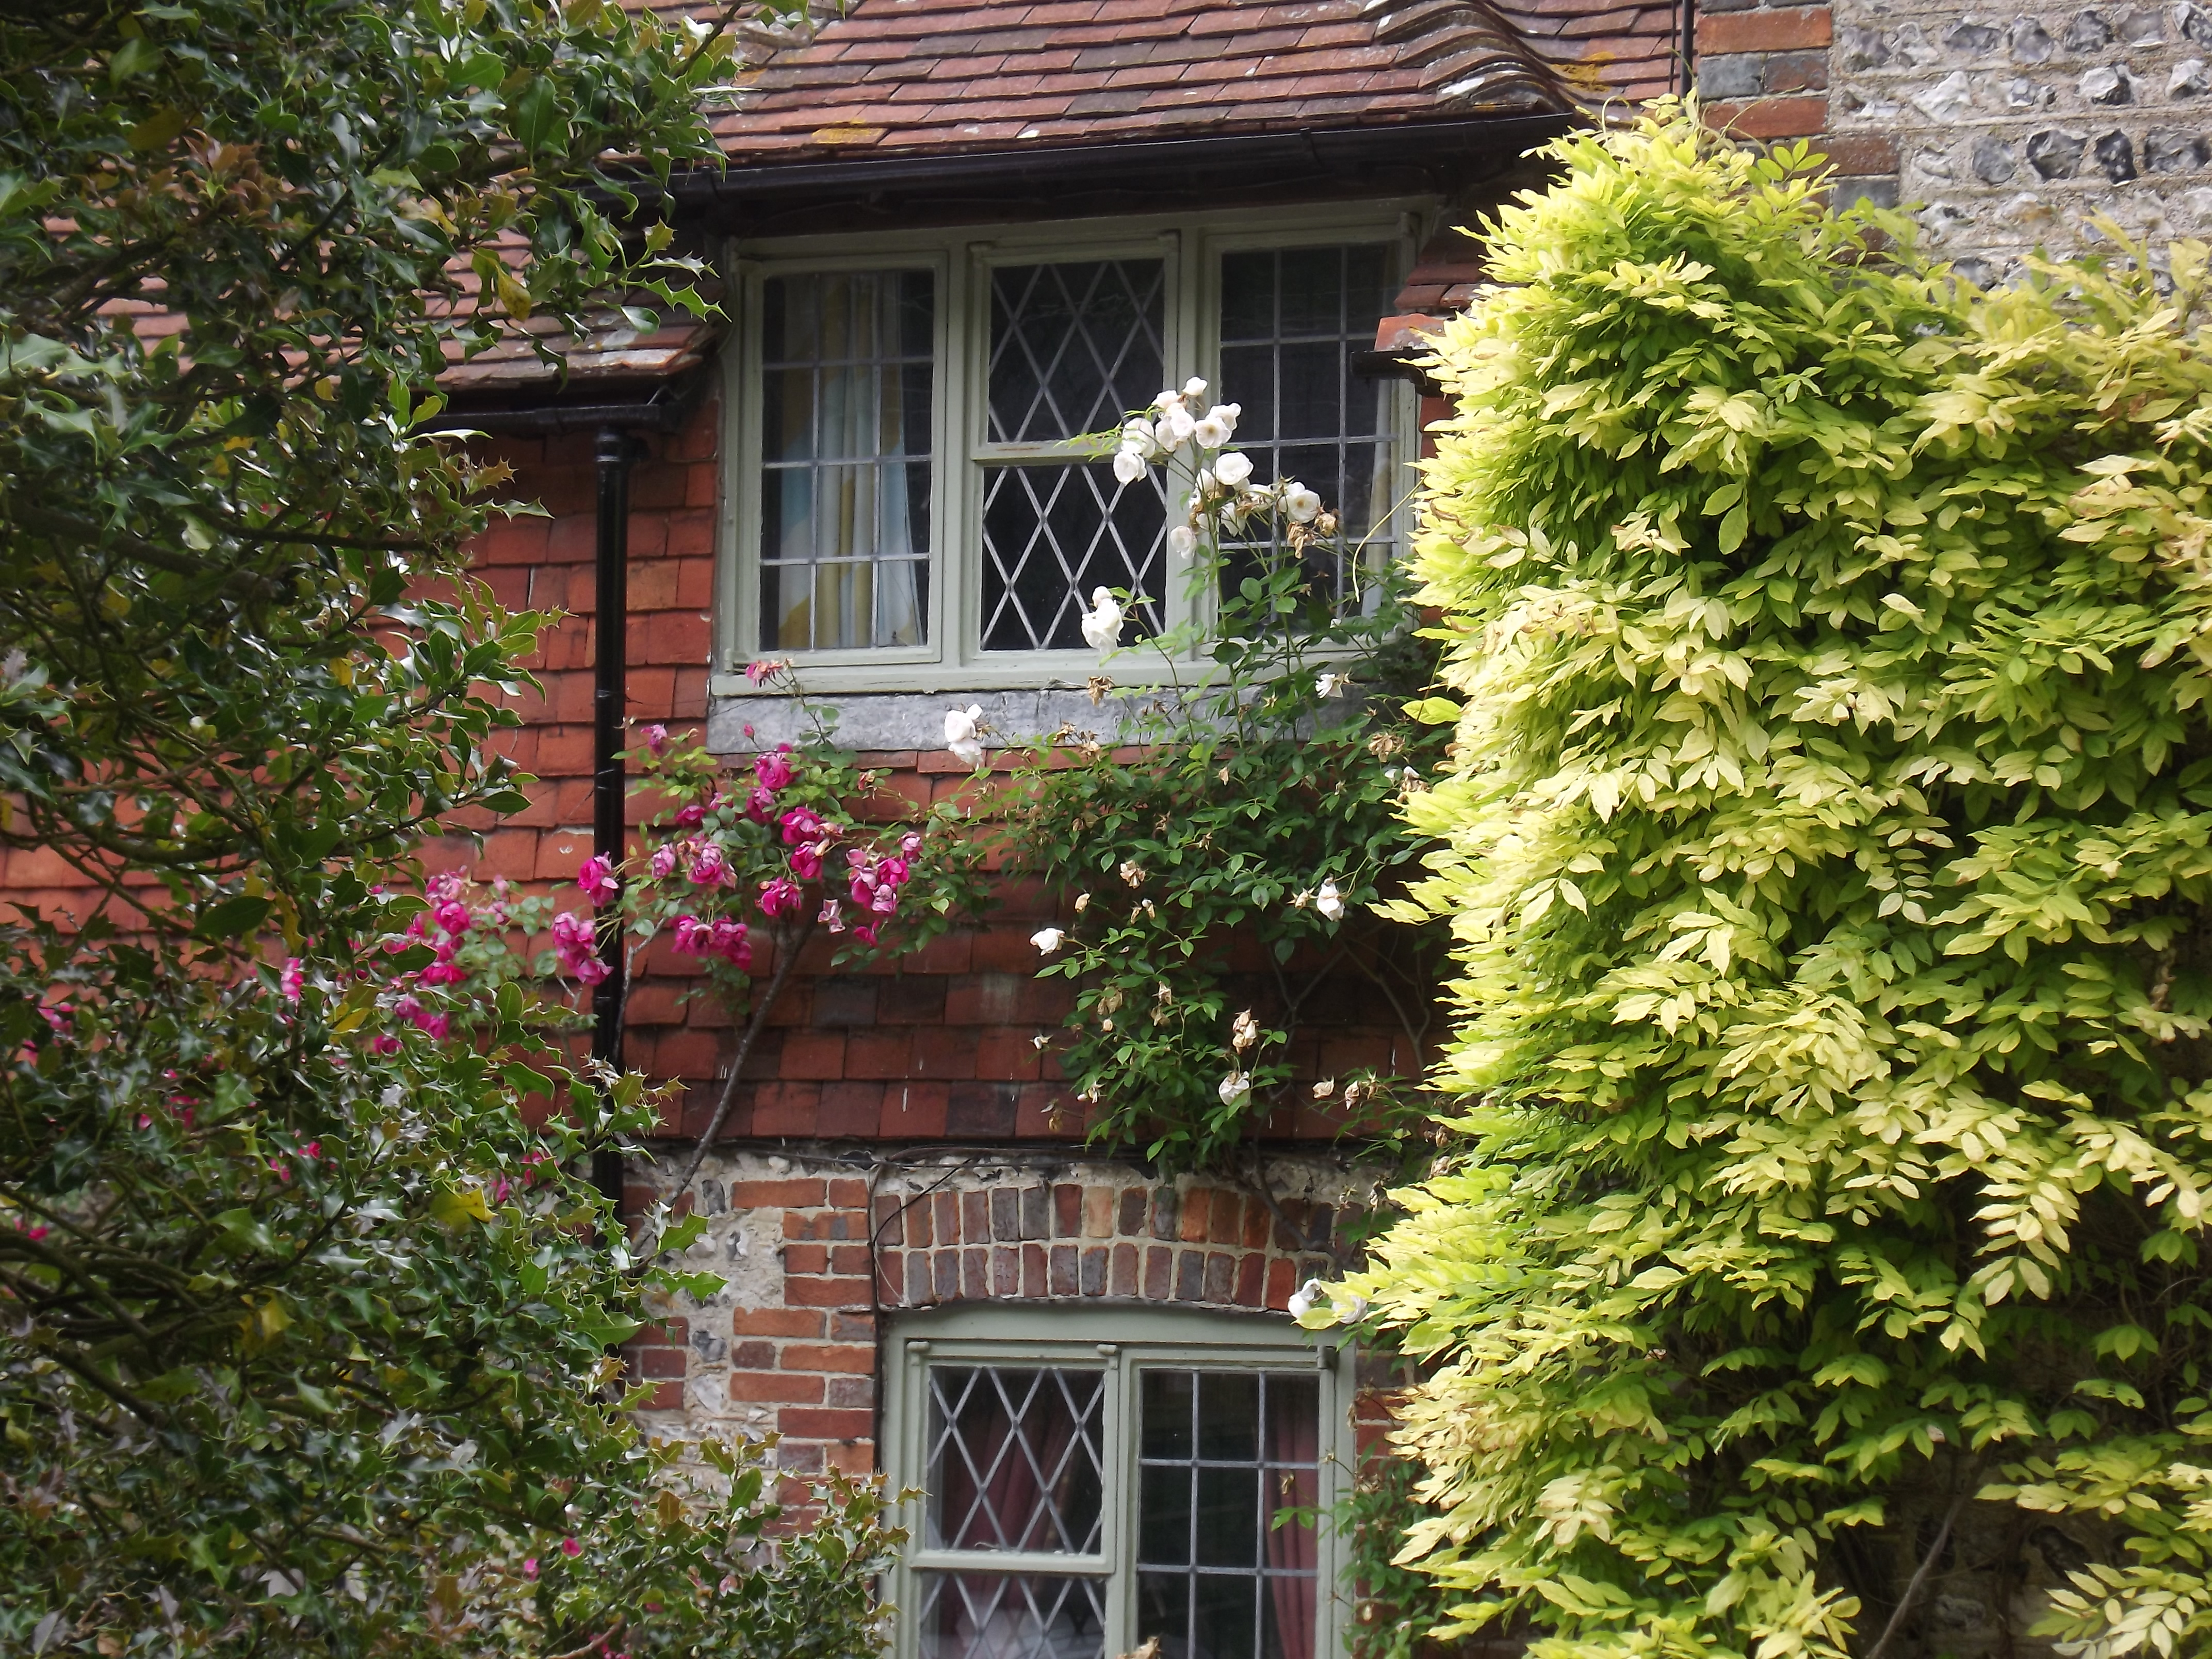 Seven sisters une randonn e d coiffante from the for Photos cottages anglais